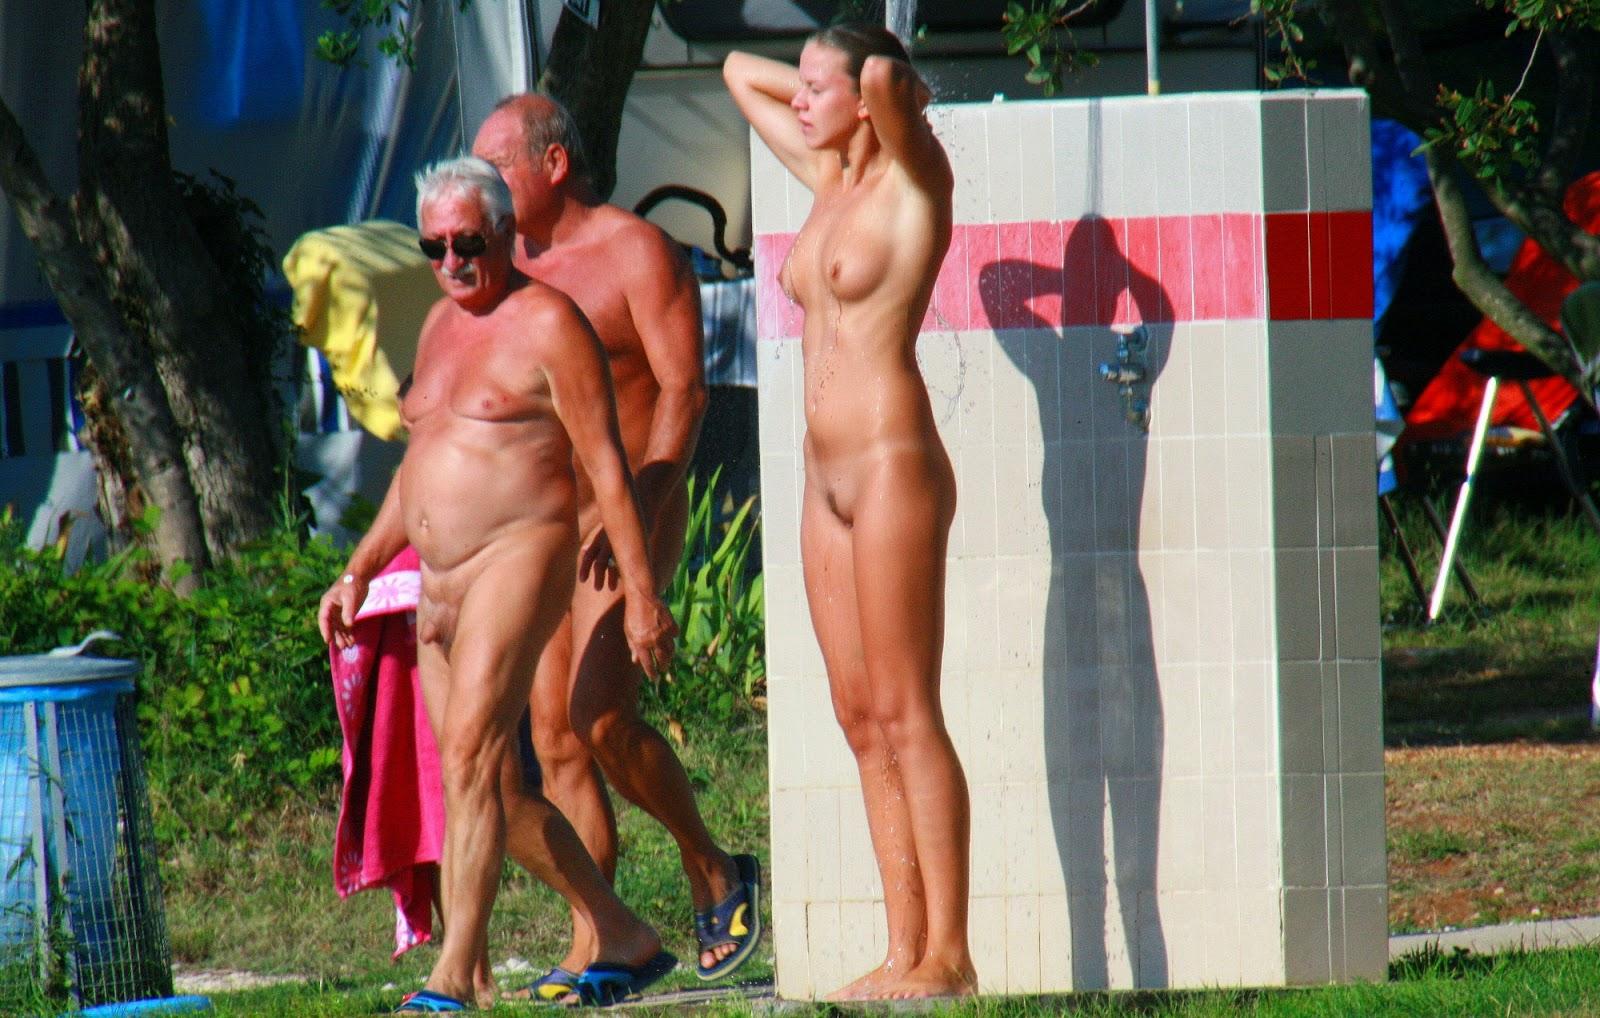 Junior nudist neked photos